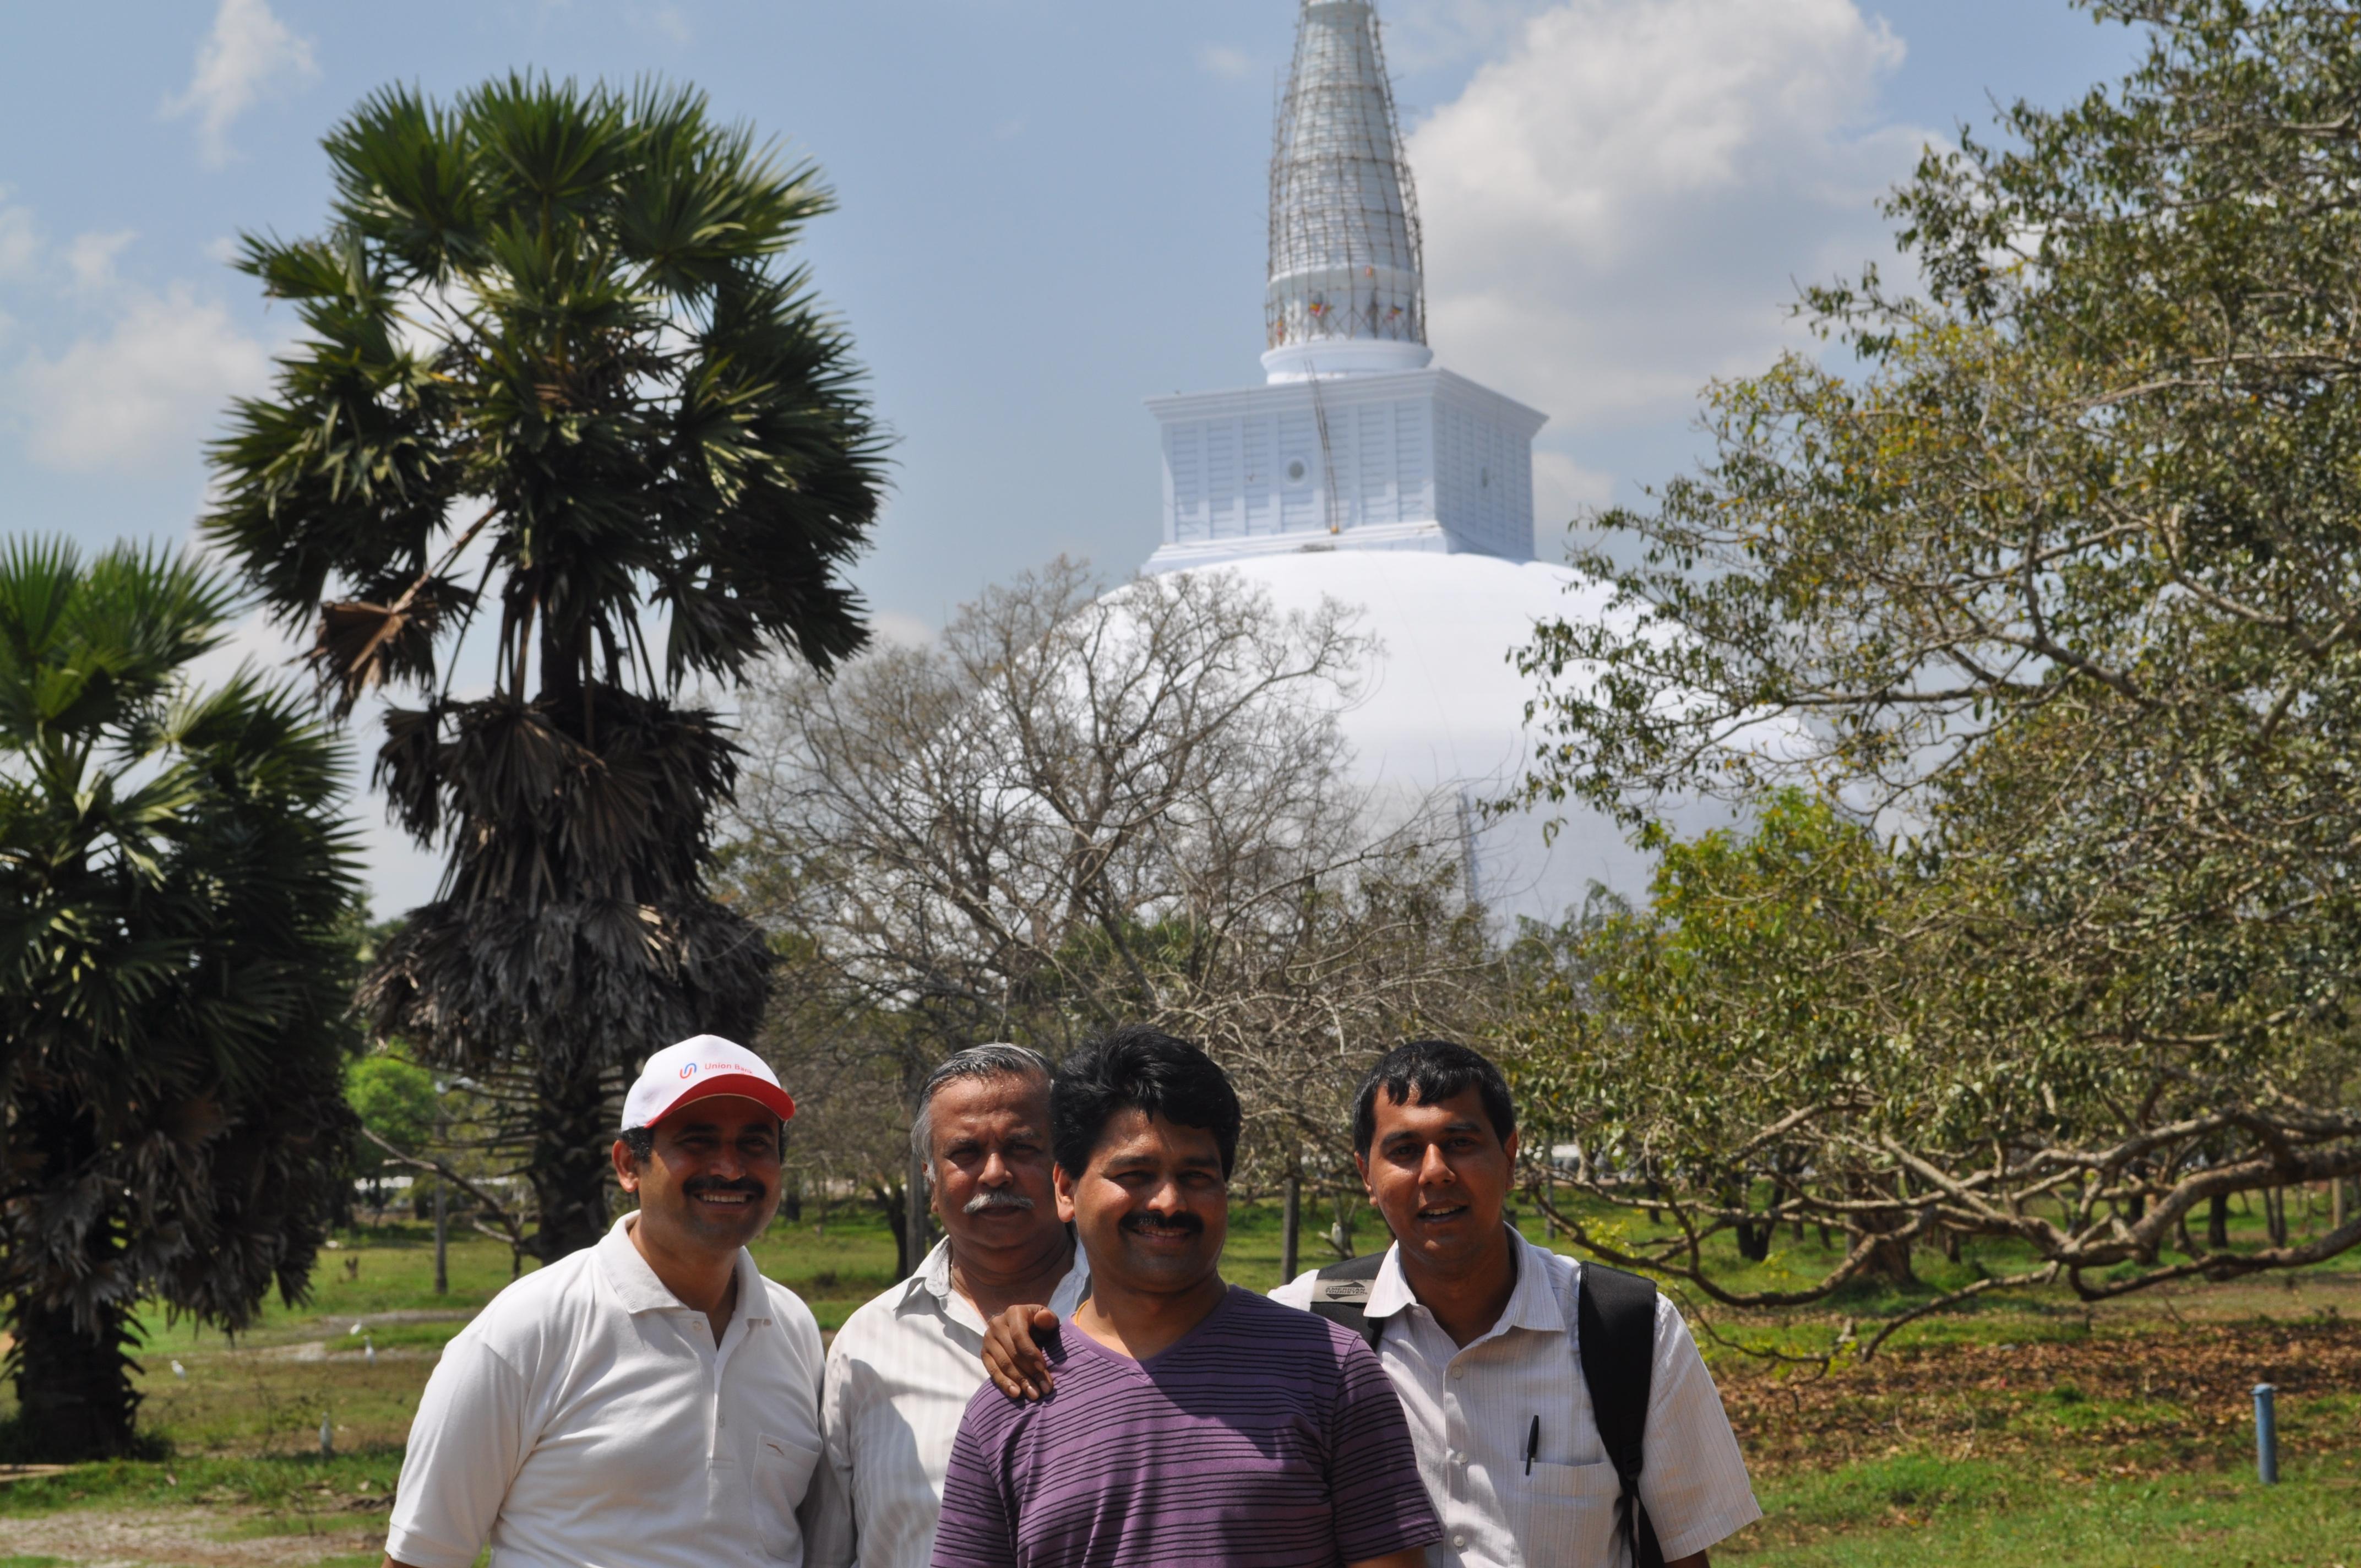 A must visit site in Sri Lanka